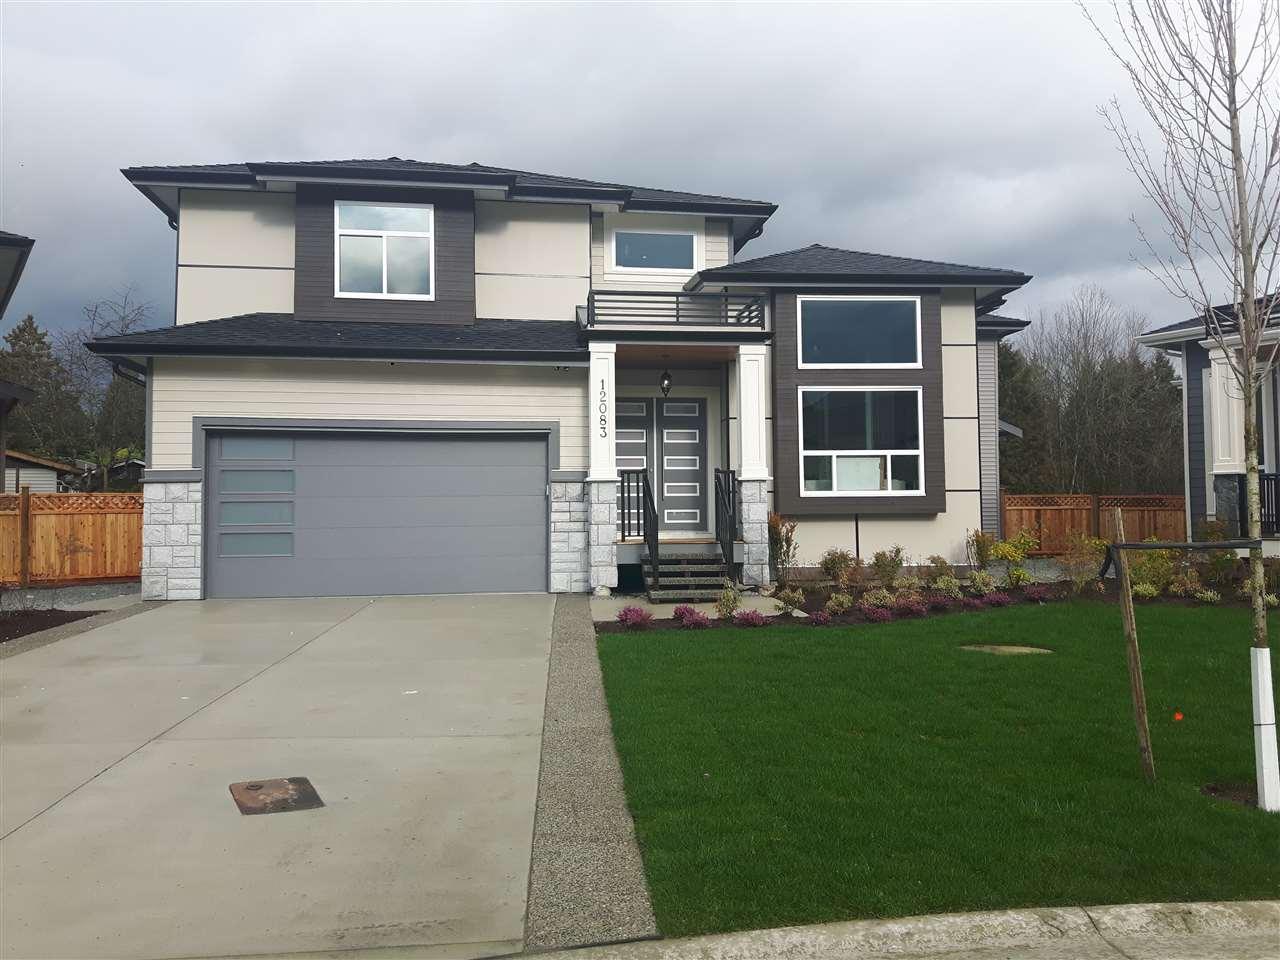 Detached at 12072 249 STREET, Maple Ridge, British Columbia. Image 1